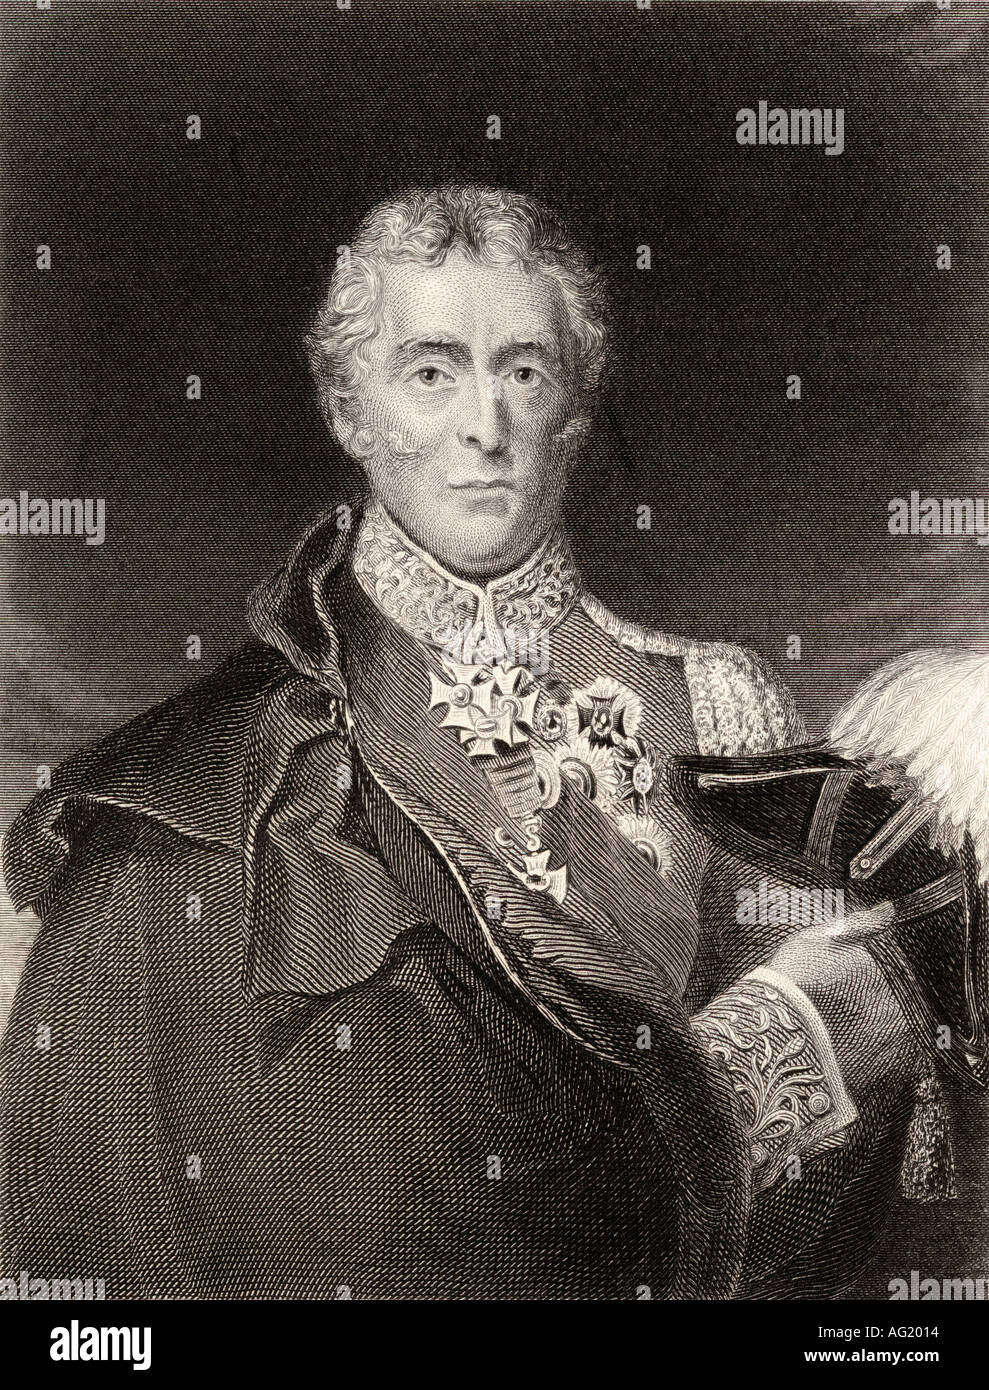 Arthur Wellesley, 1st Duke of Wellington, 1769 -1852. British soldier and statesman. - Stock Image